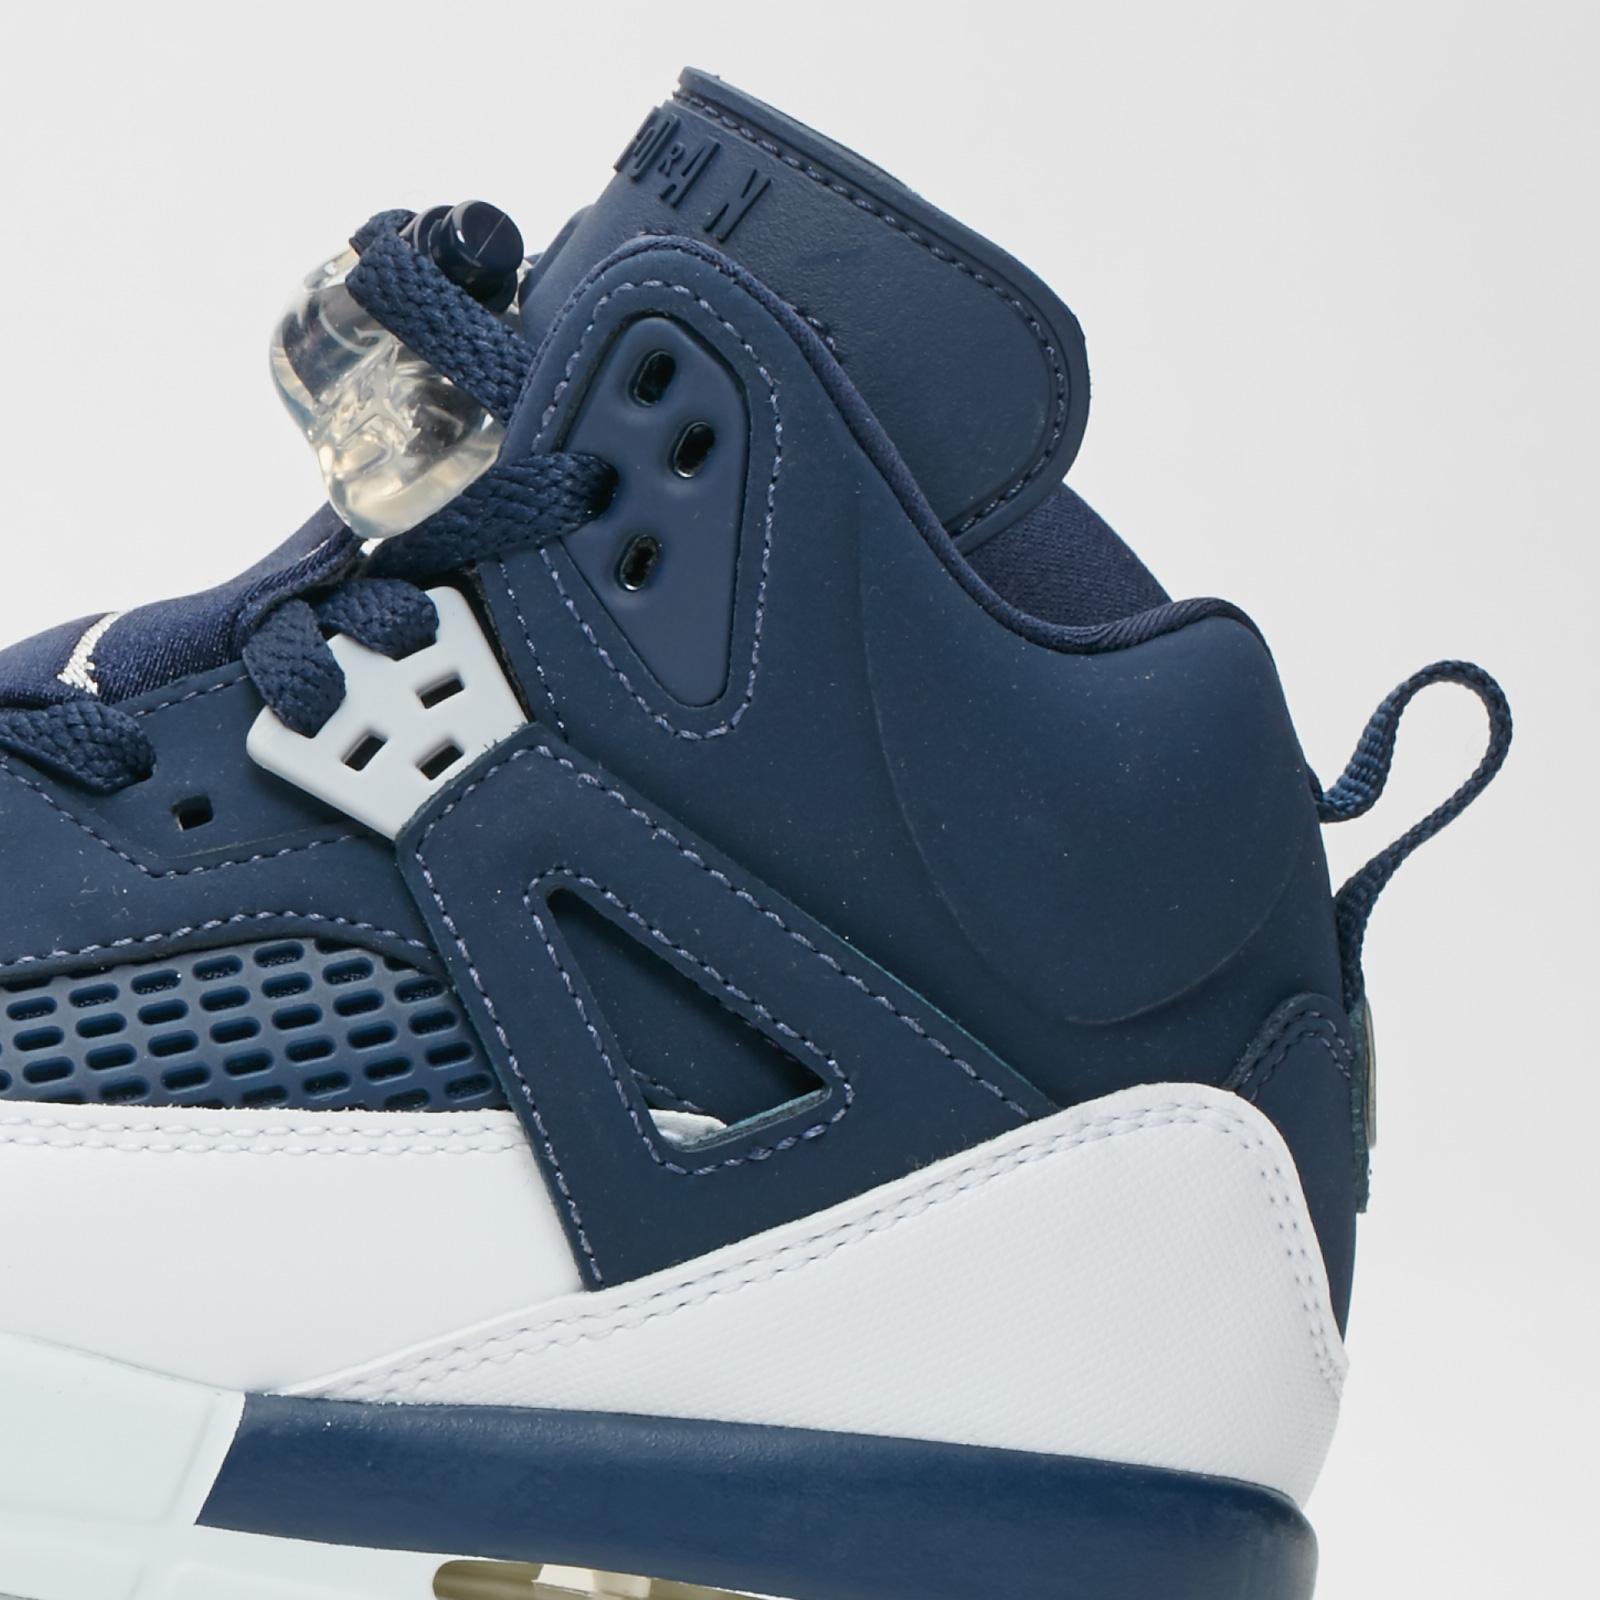 a806e7b1b6f4 Jordan Brand Air Jordan Spizike (GS) - 317321-406 - Sneakersnstuff ...